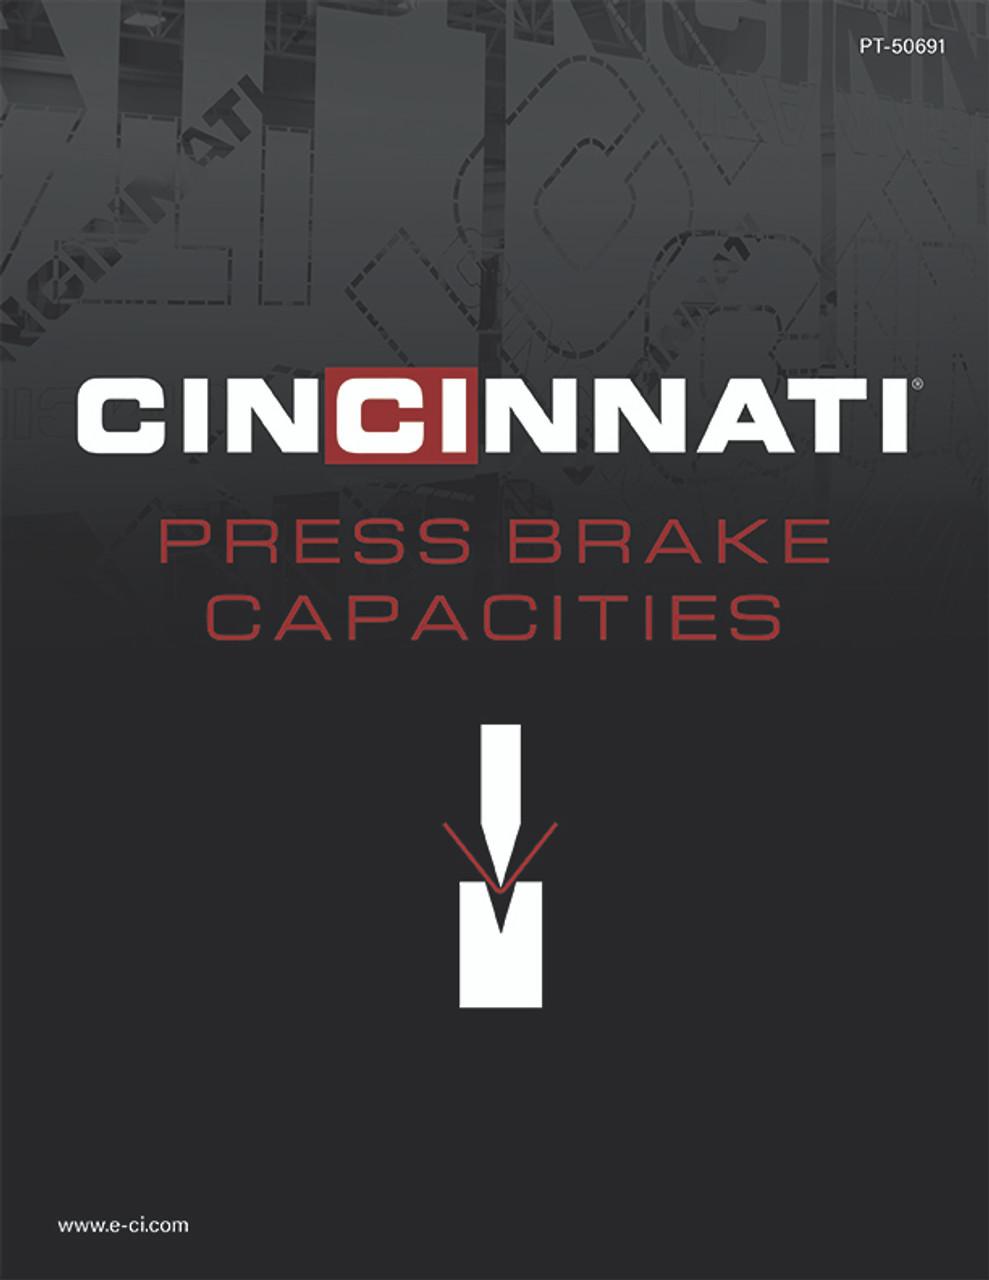 Press Brake Capacities